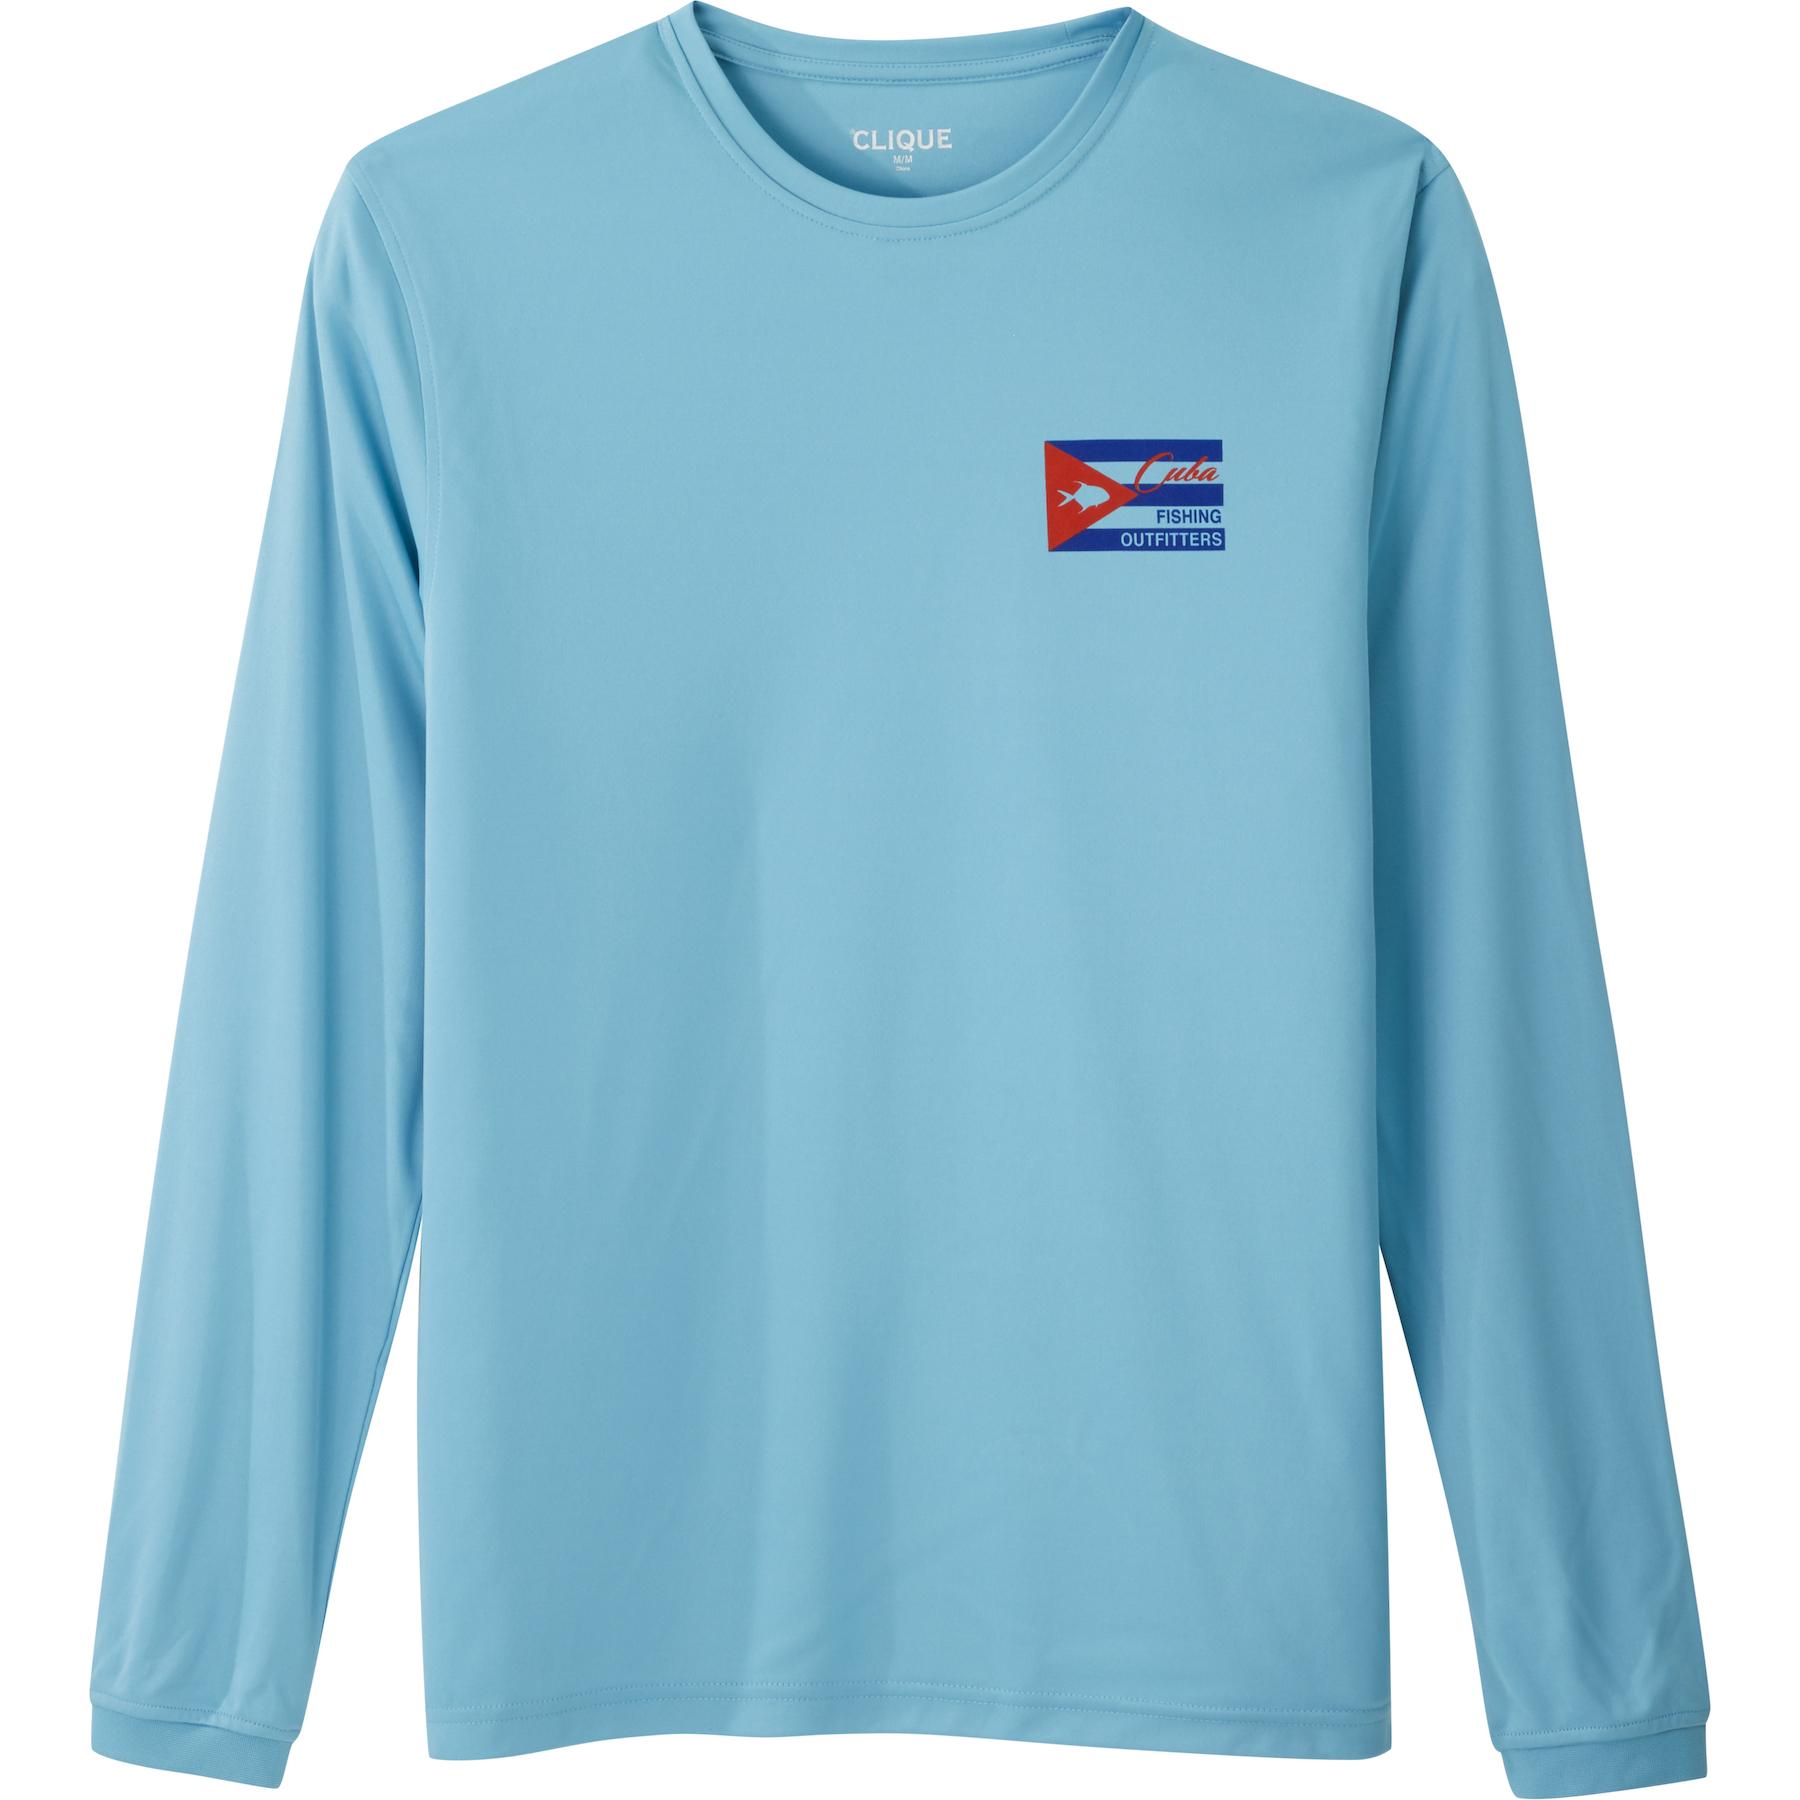 CubaSunShirt-Blue_Front copy.jpg